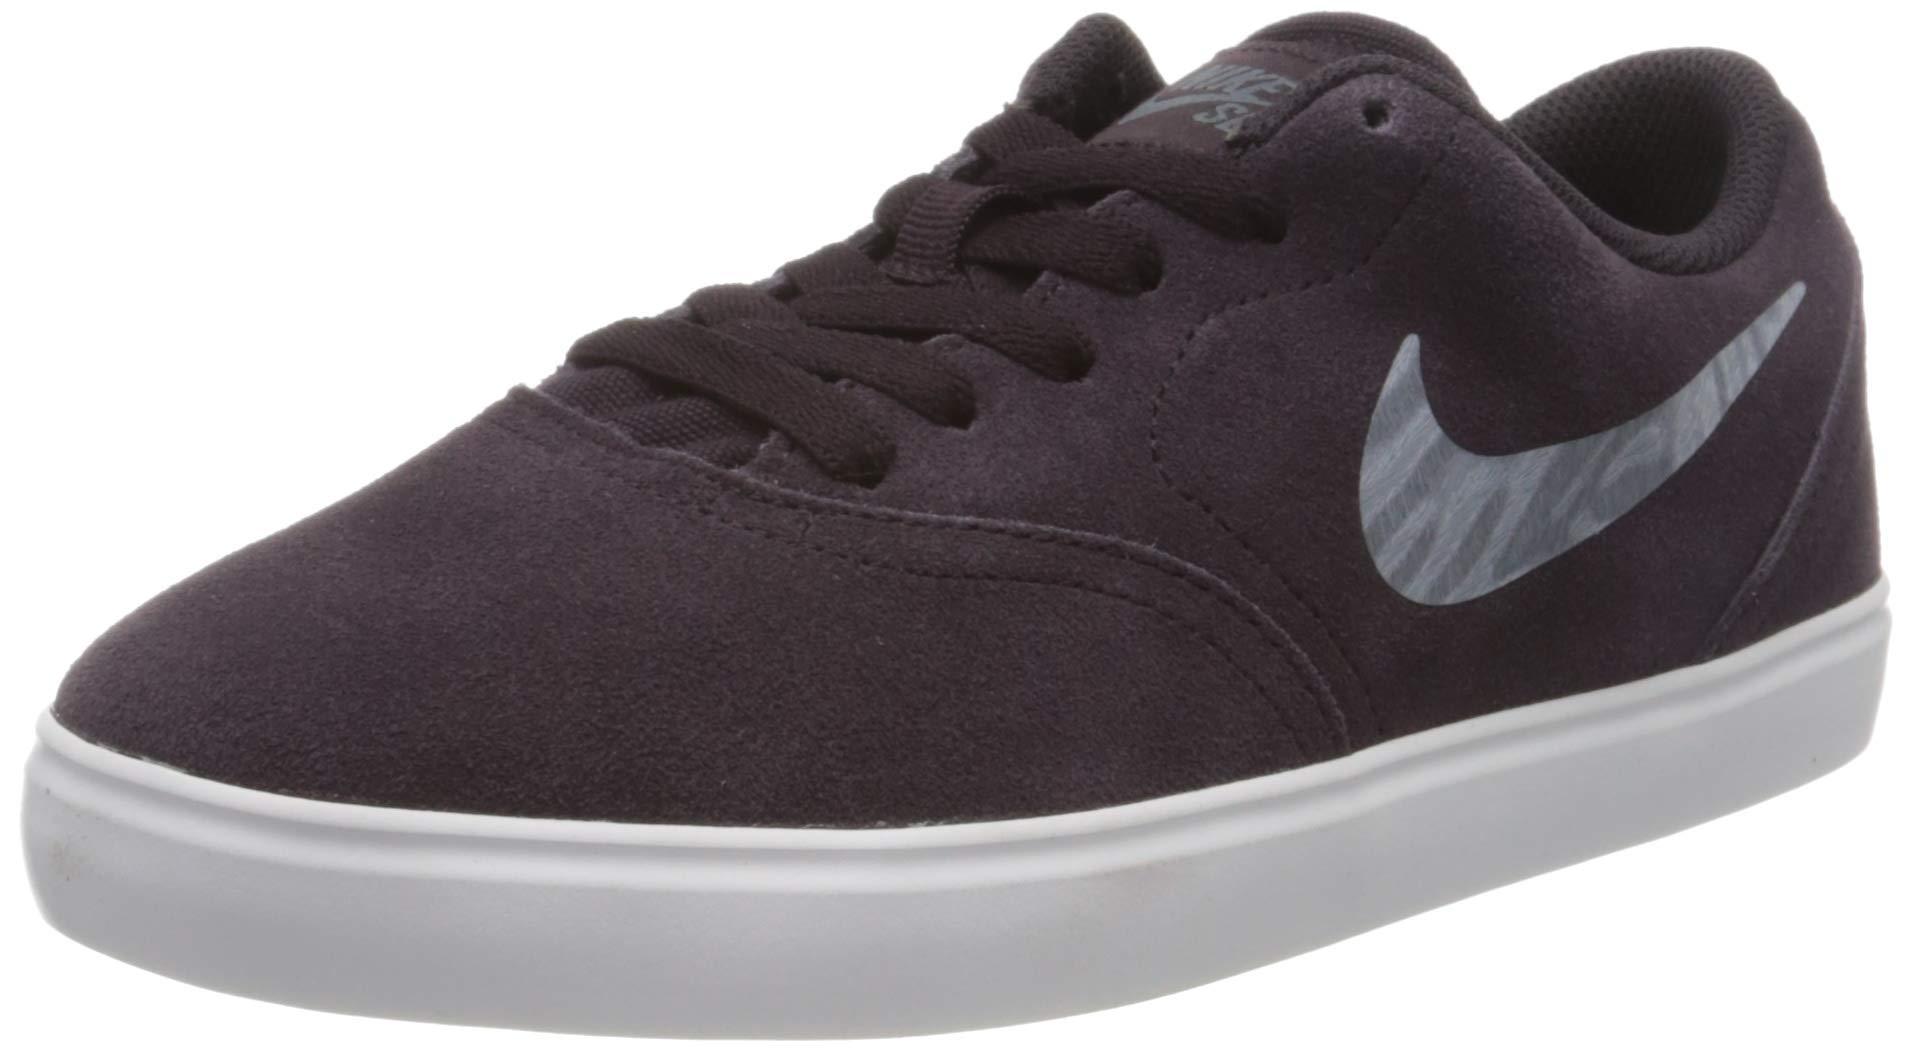 SB Check Suede Ess+ (GS), Chaussures de Skateboard Mixte Adulte Nike